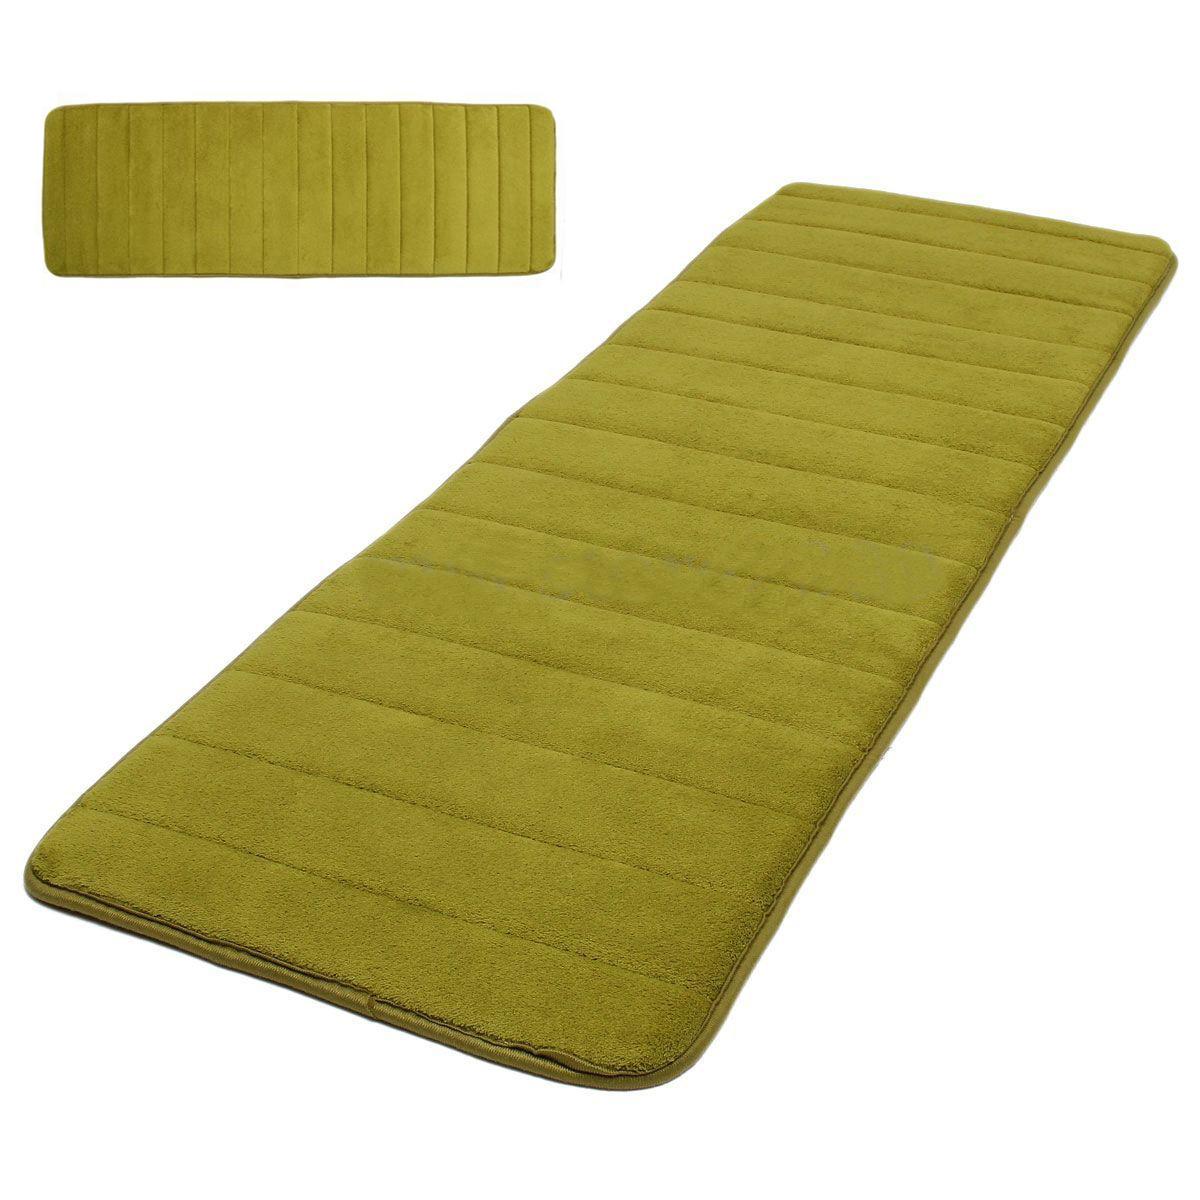 120x40cm absorbent nonslip memory foam kitchen bedroom door mat rug carpet di ebay. Black Bedroom Furniture Sets. Home Design Ideas